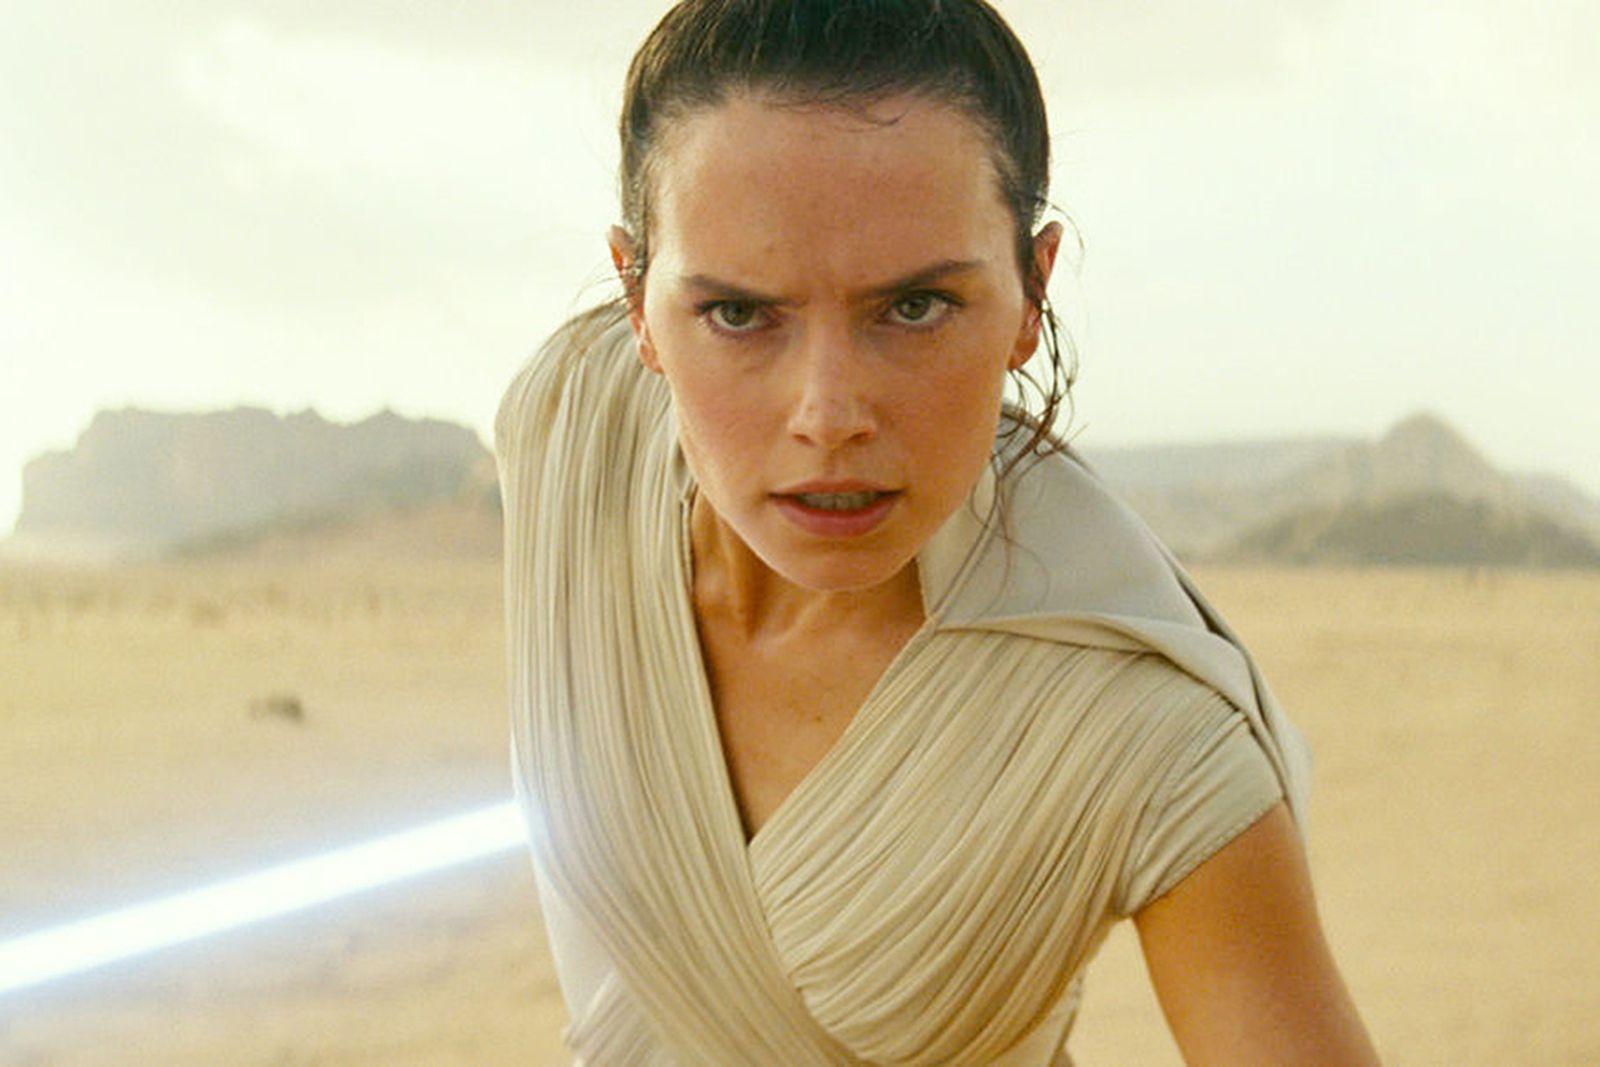 disney star wars movies release dates Avatar Star Wars: The Rise of Skywalker fox